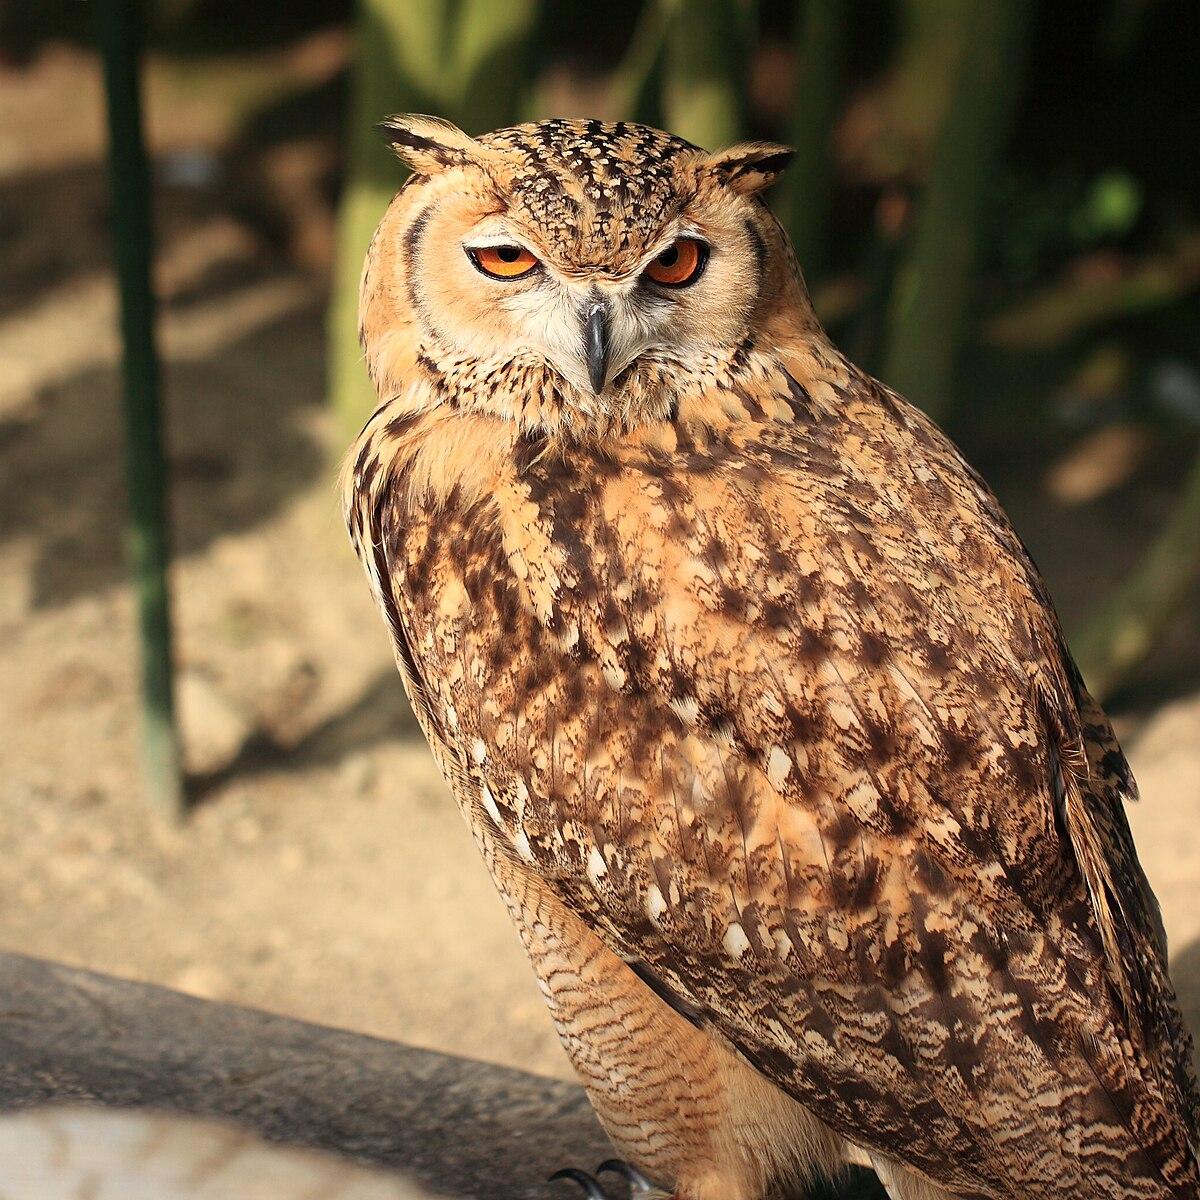 Pharaoh eagle-owl - Wikipedia